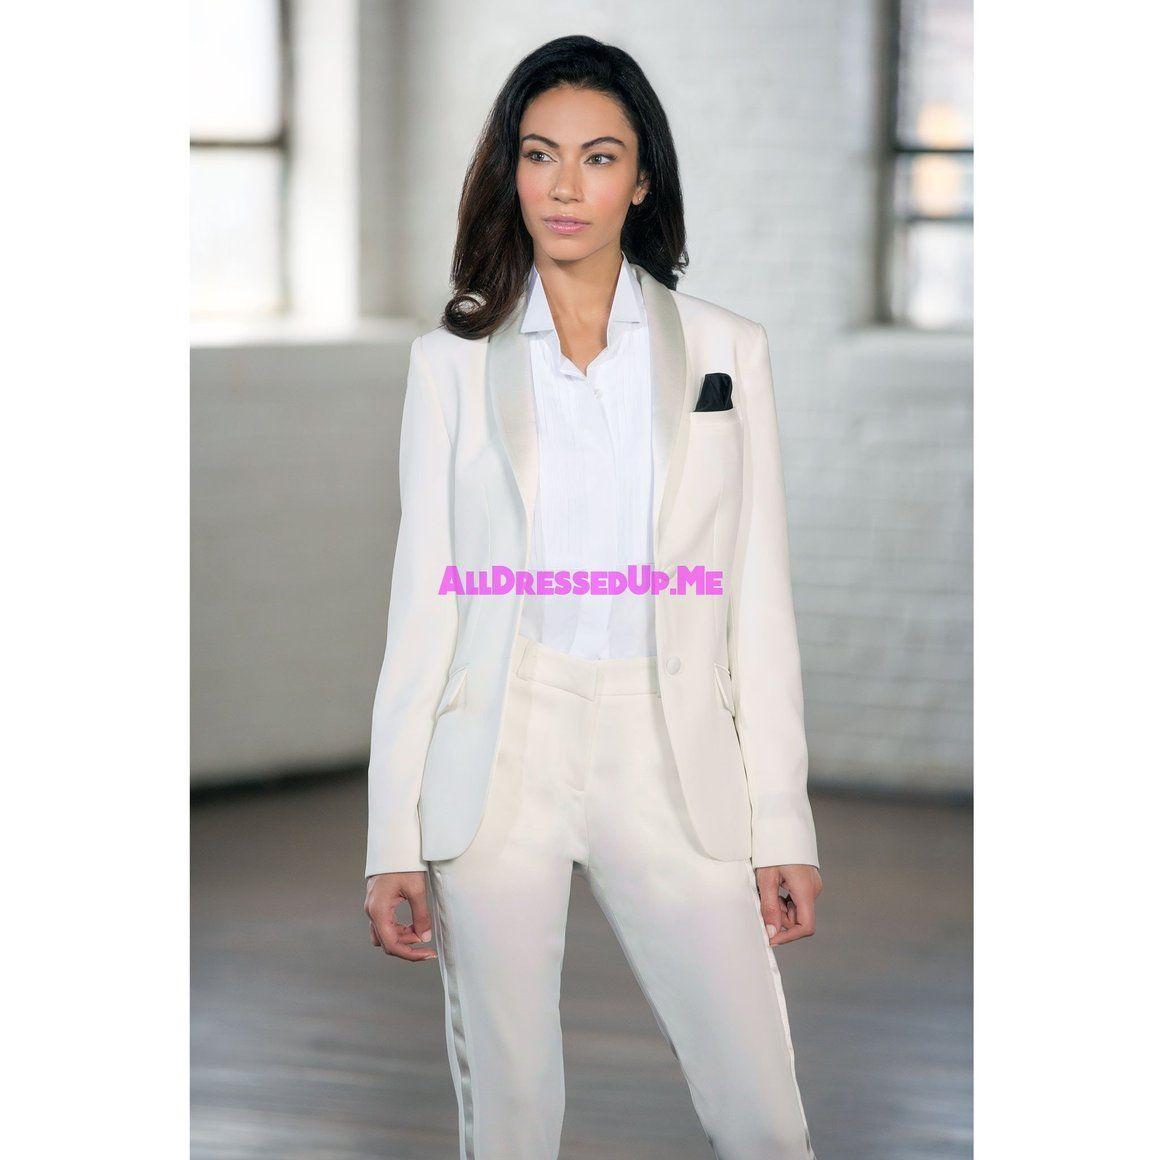 Tux Rent White Wedding Suit Women Suits Wedding Tuxedo Women [ 1160 x 1160 Pixel ]